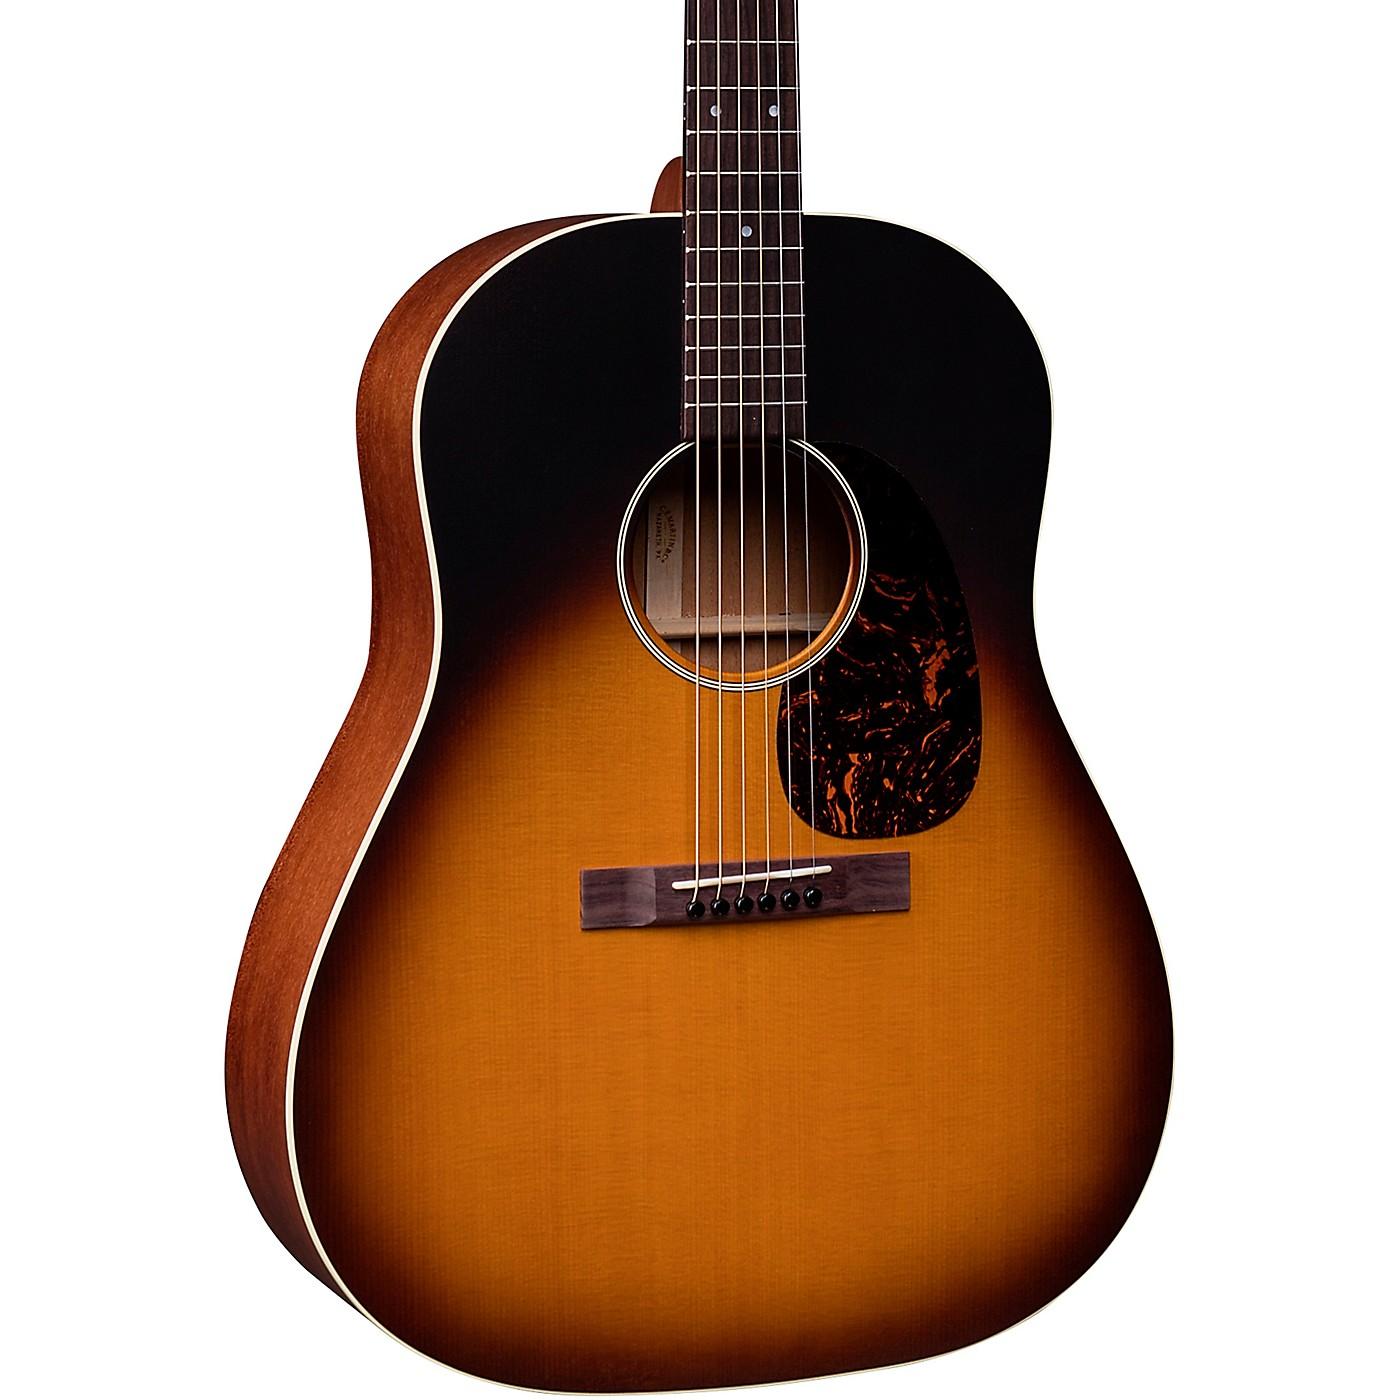 Martin DSS-17 Whiskey Sunset Dreadnought Acoustic Guitar thumbnail